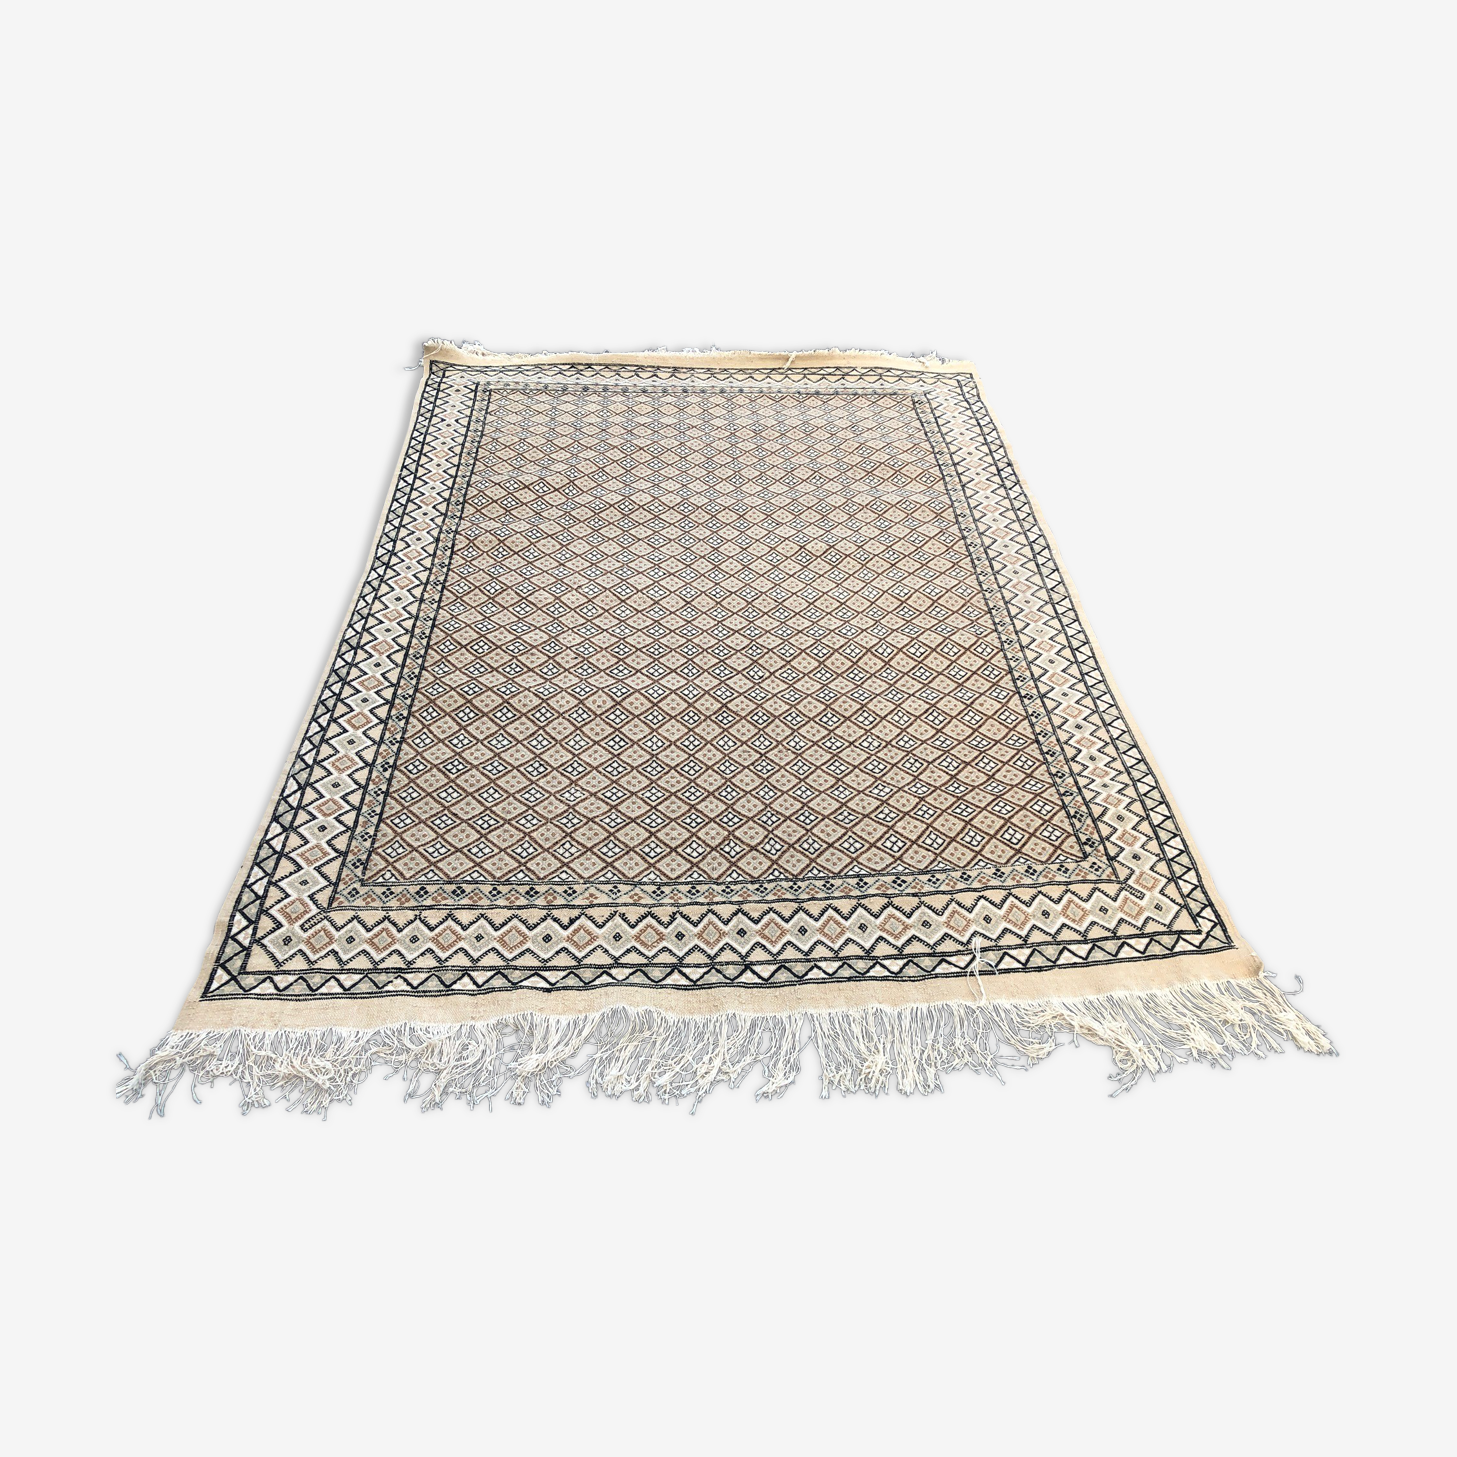 Handmade wool rug of the 1970s 240x170cm